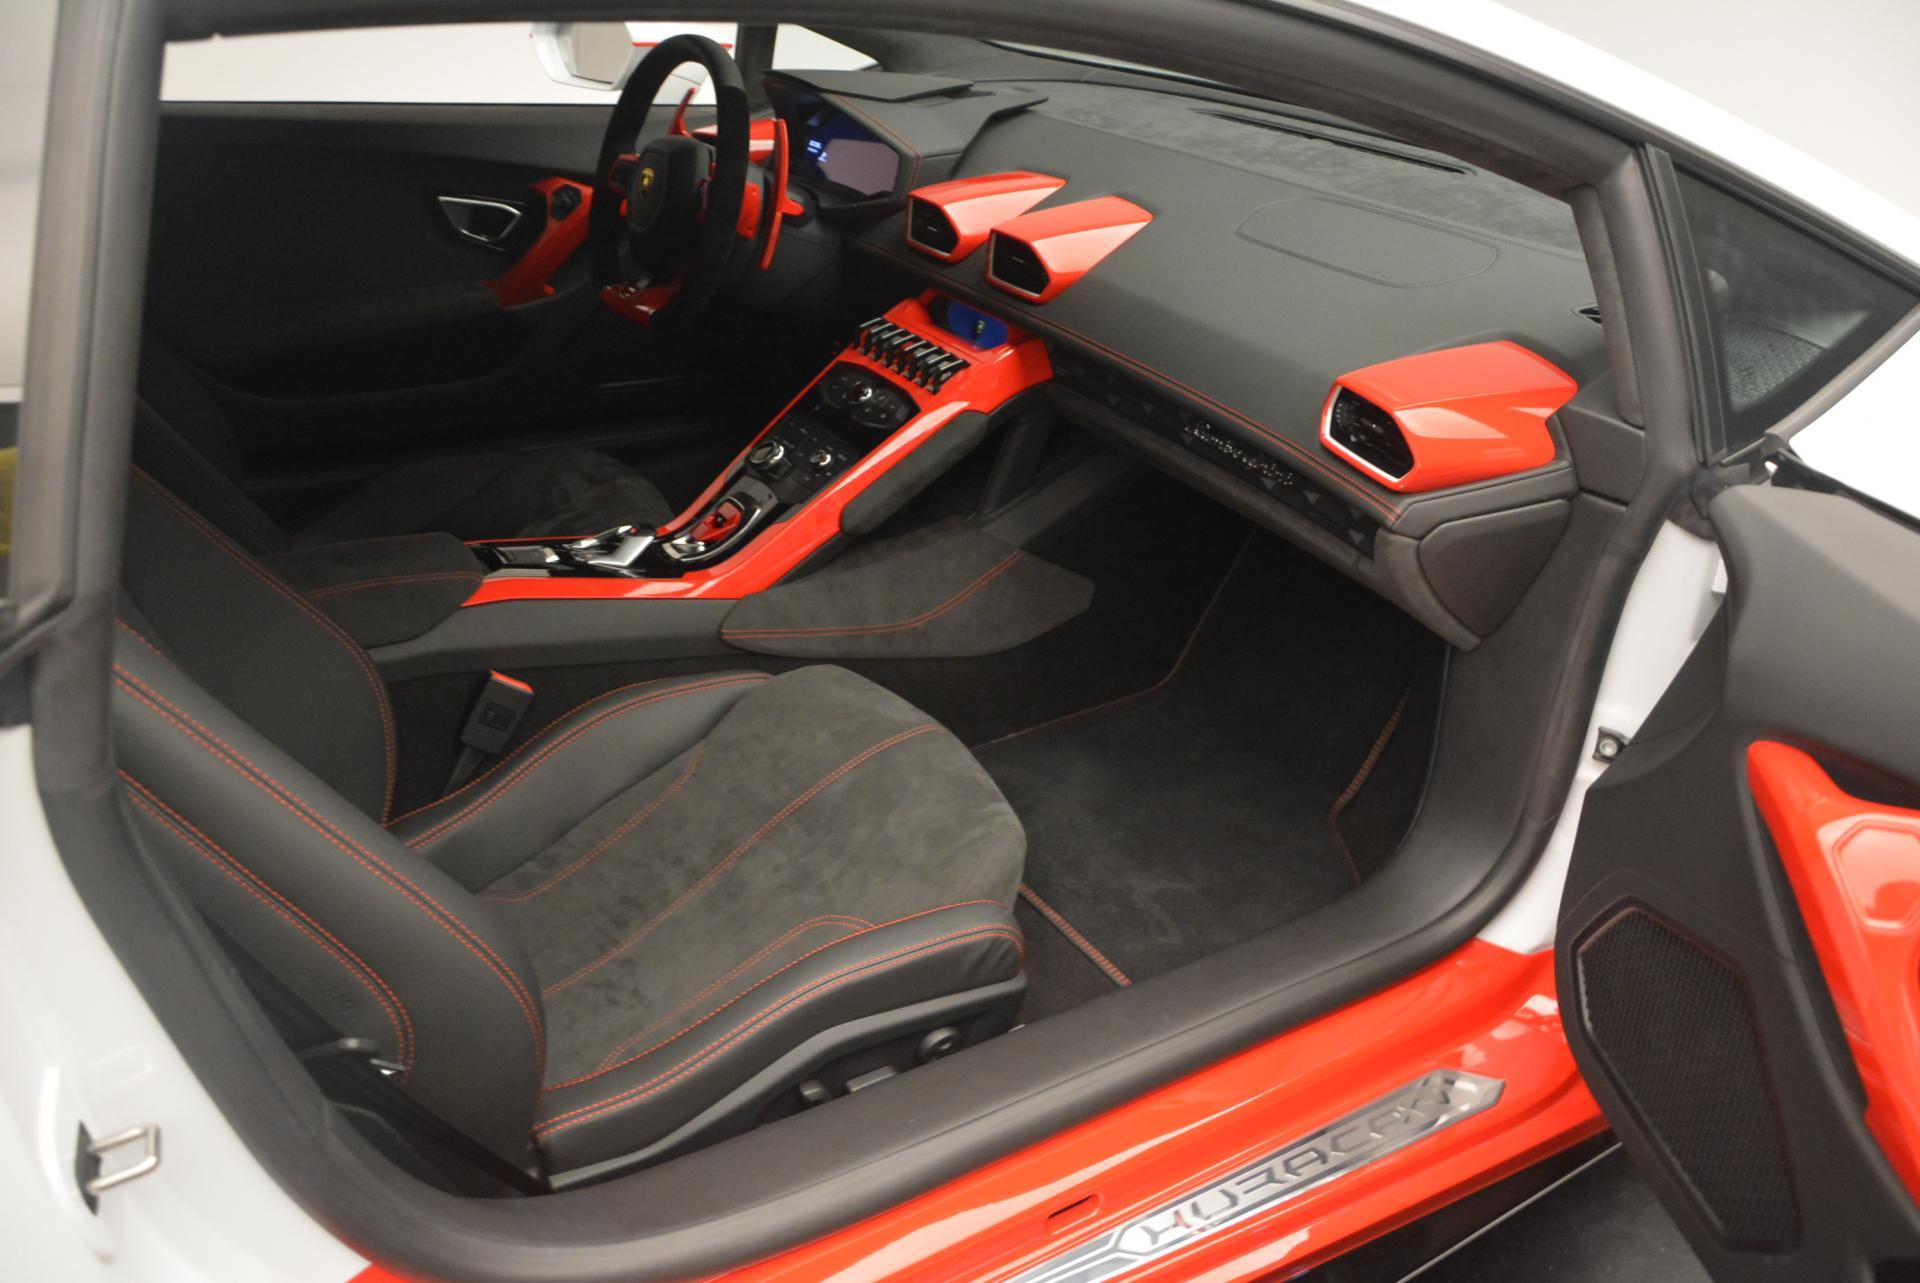 Used 2015 Lamborghini Huracan LP610-4 For Sale In Greenwich, CT 114_p20